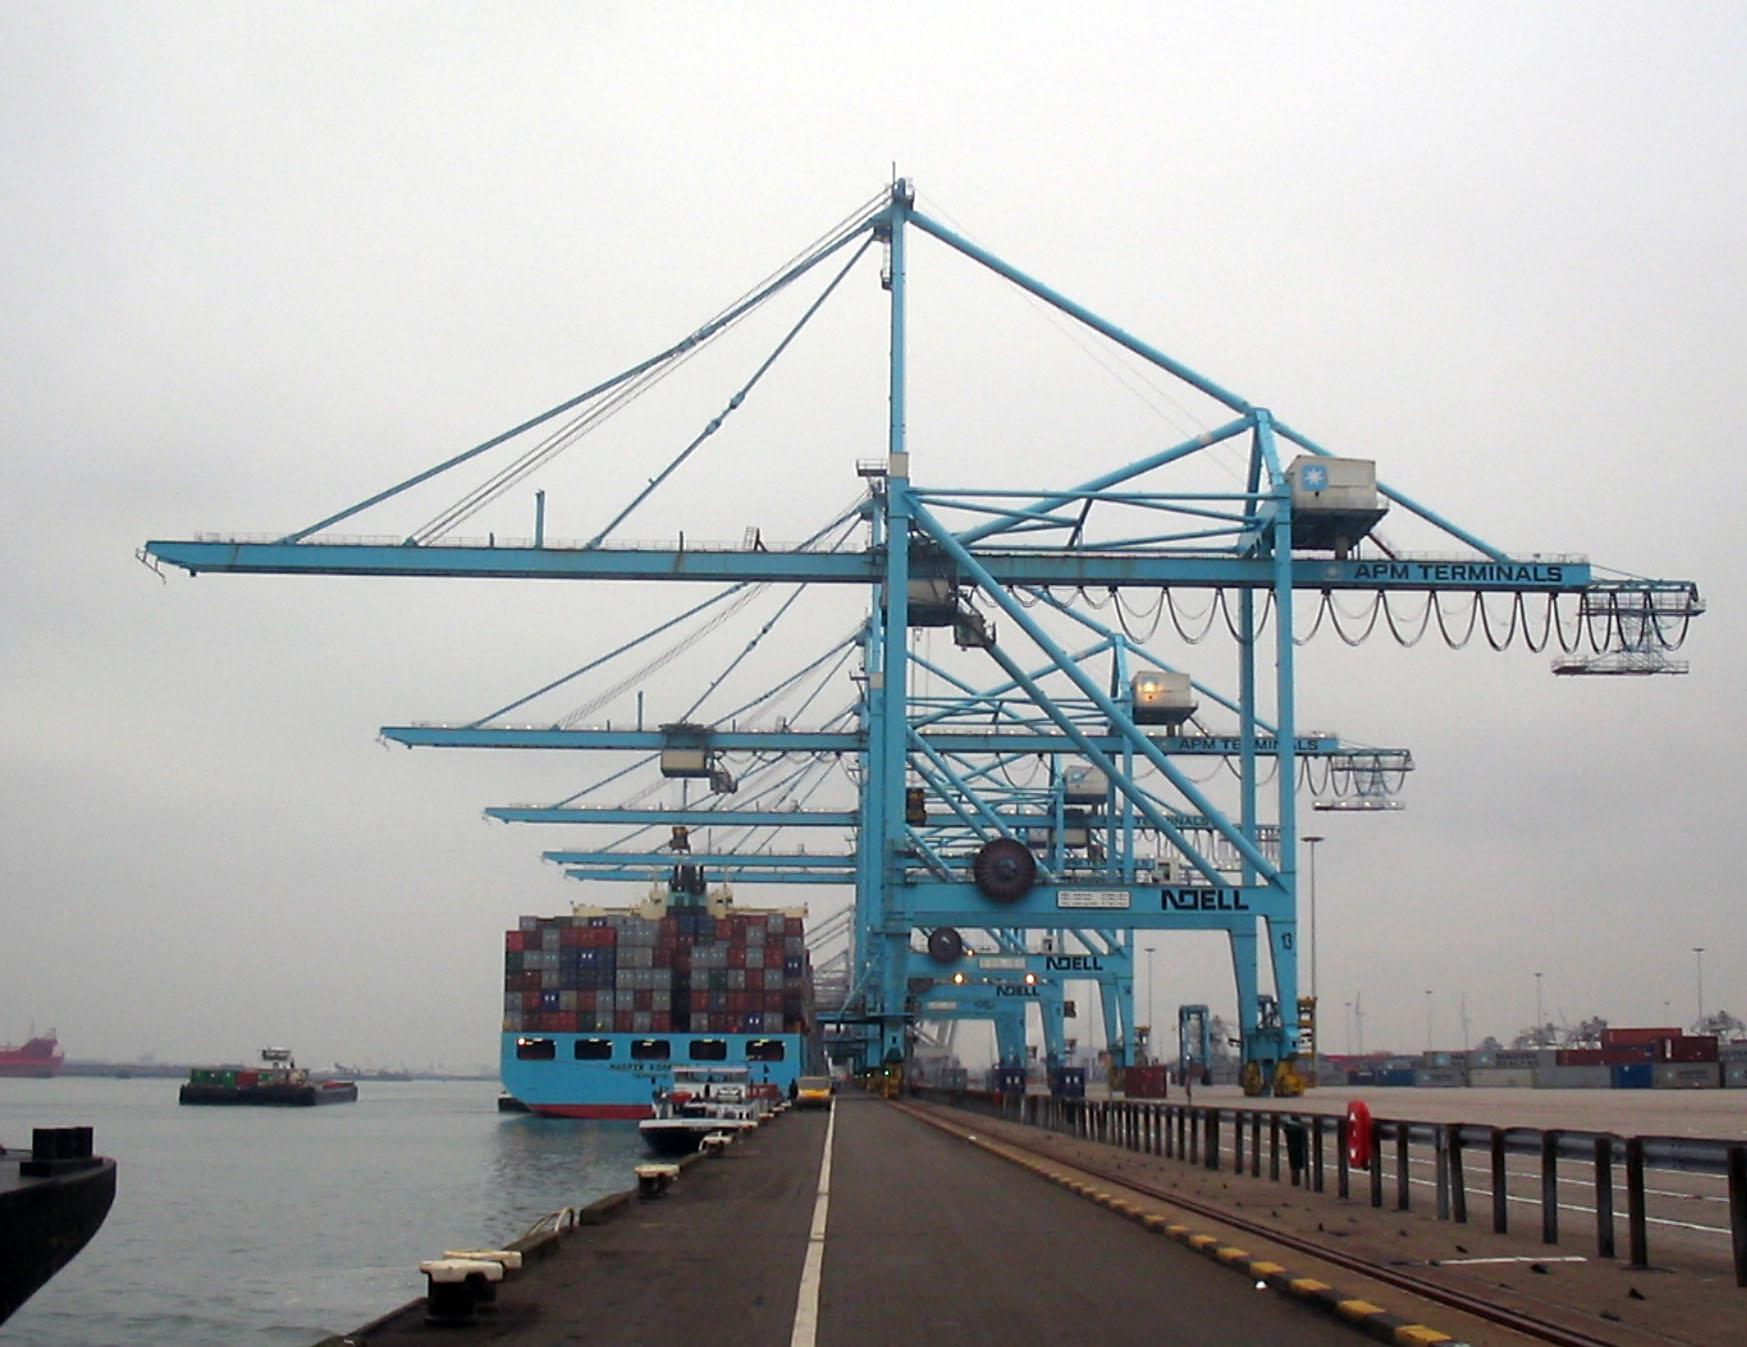 Gantry crane - Wikipedia on